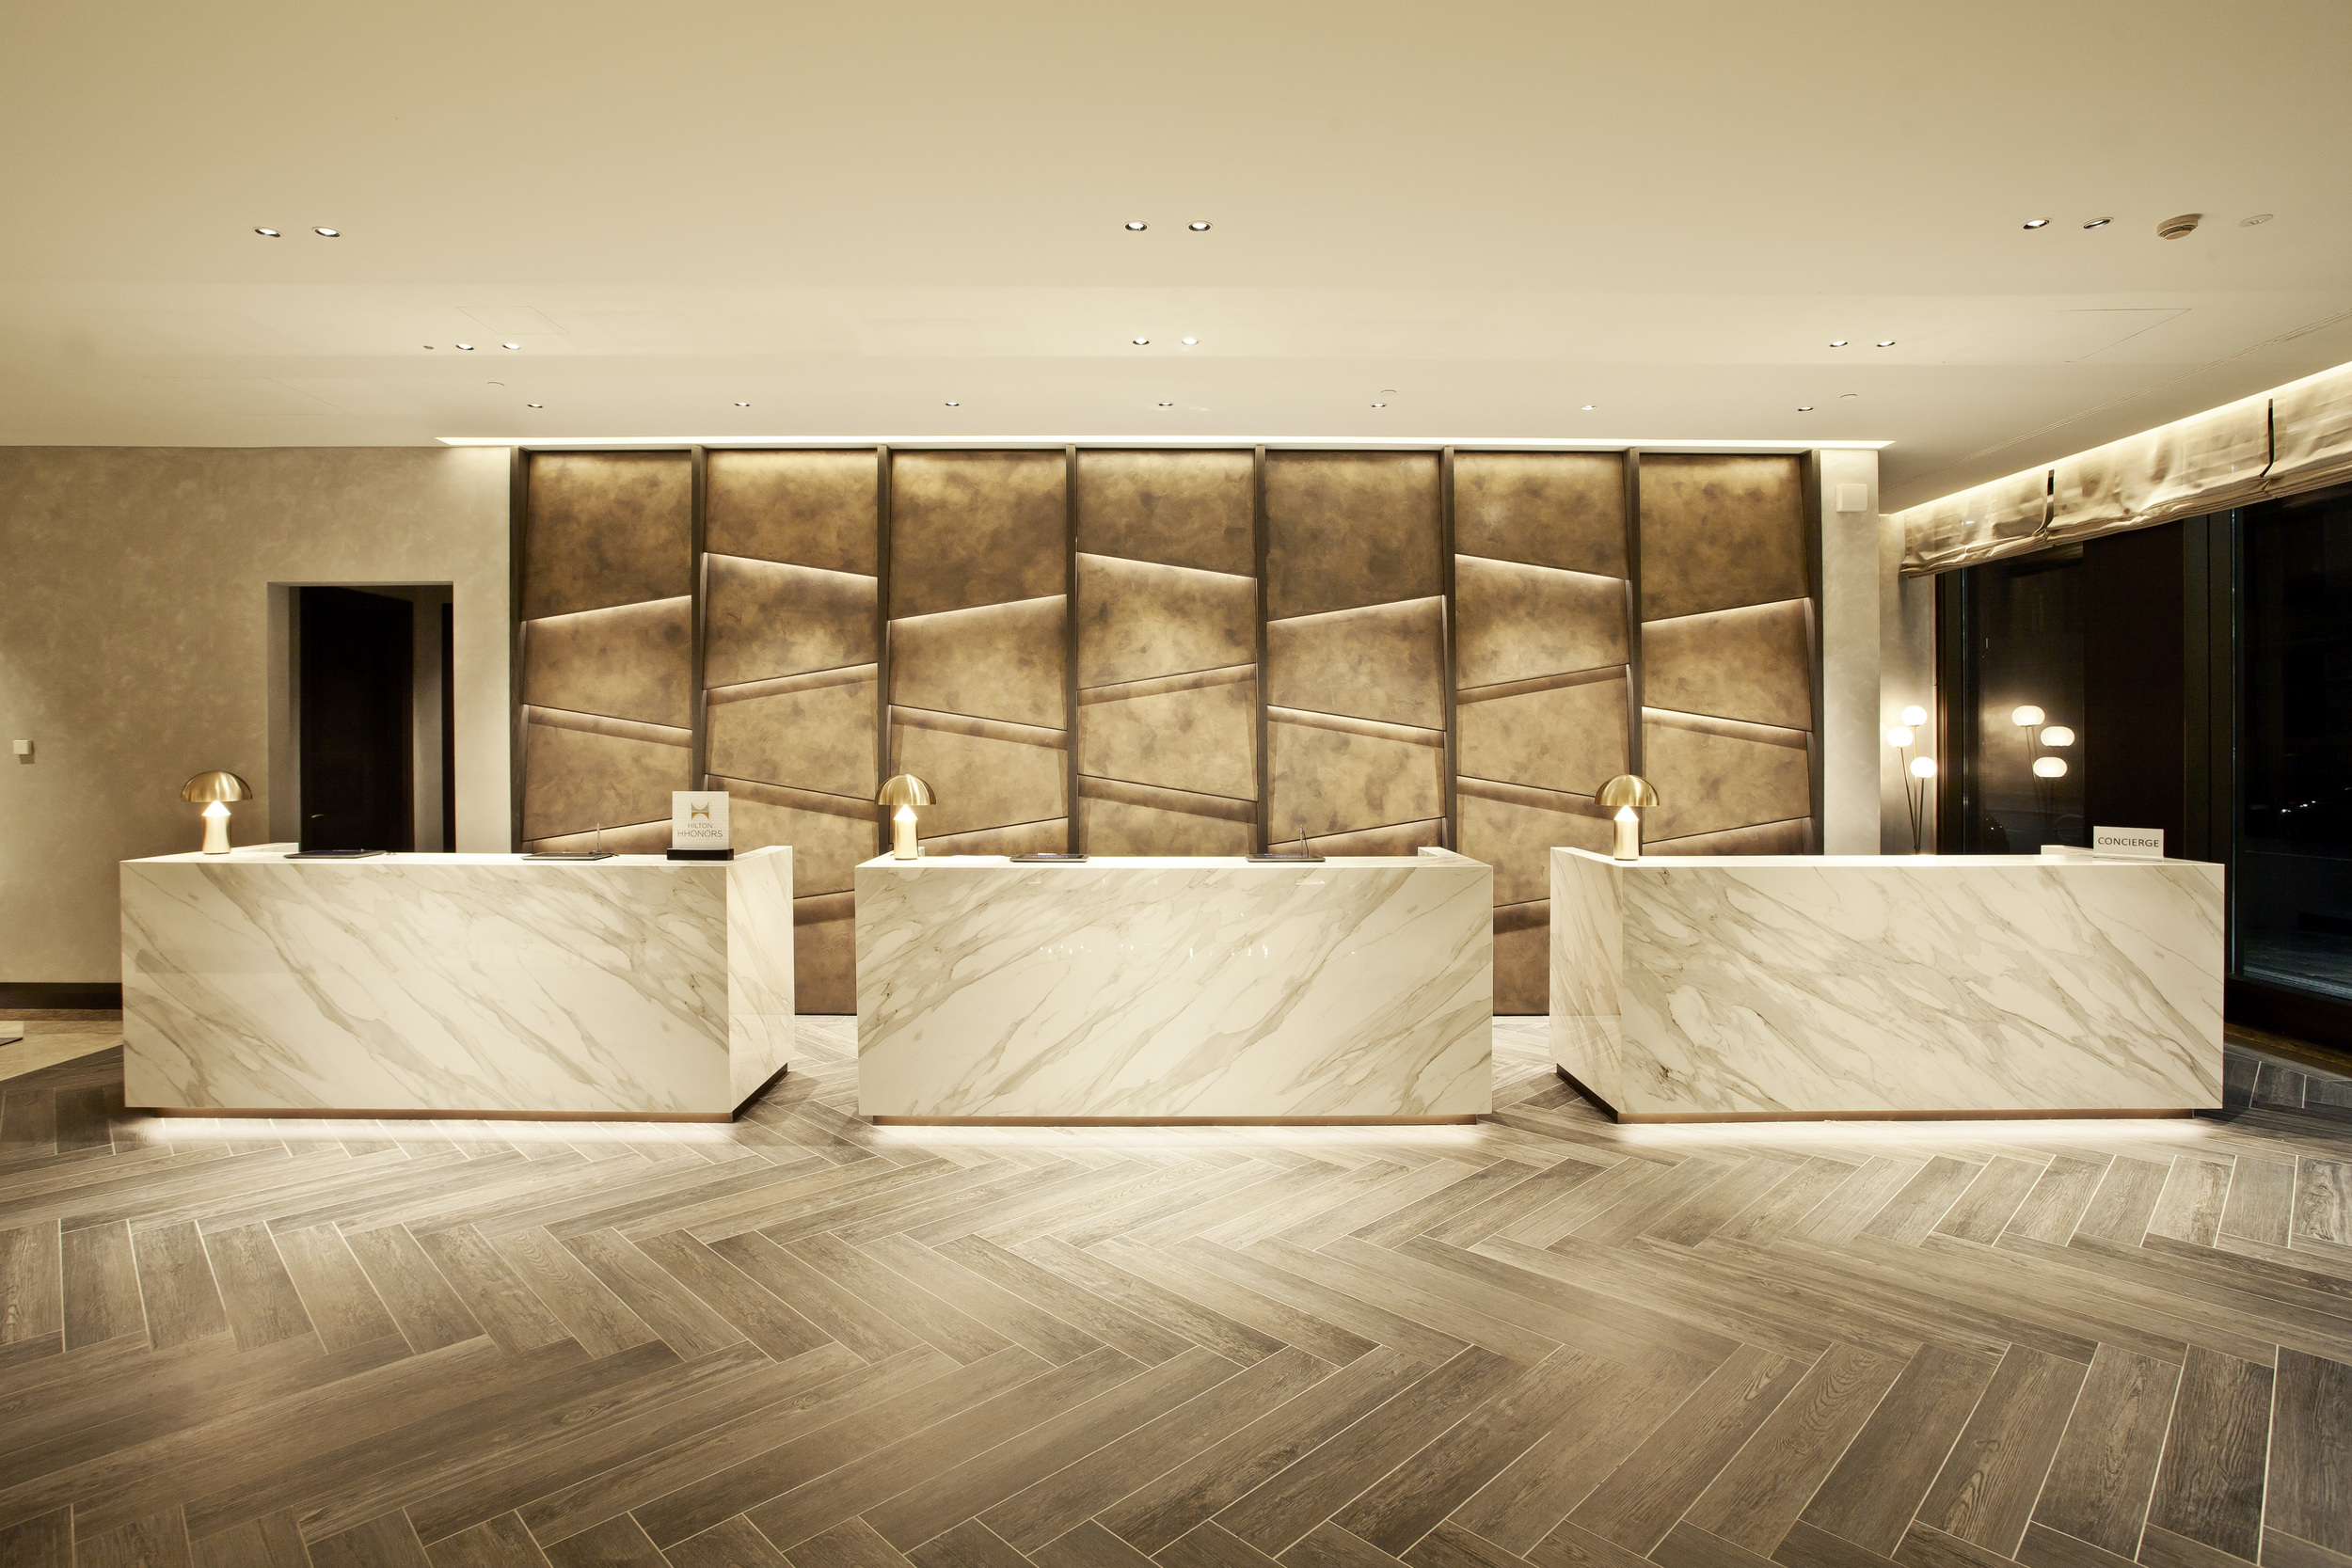 Hilton Milan Lobby